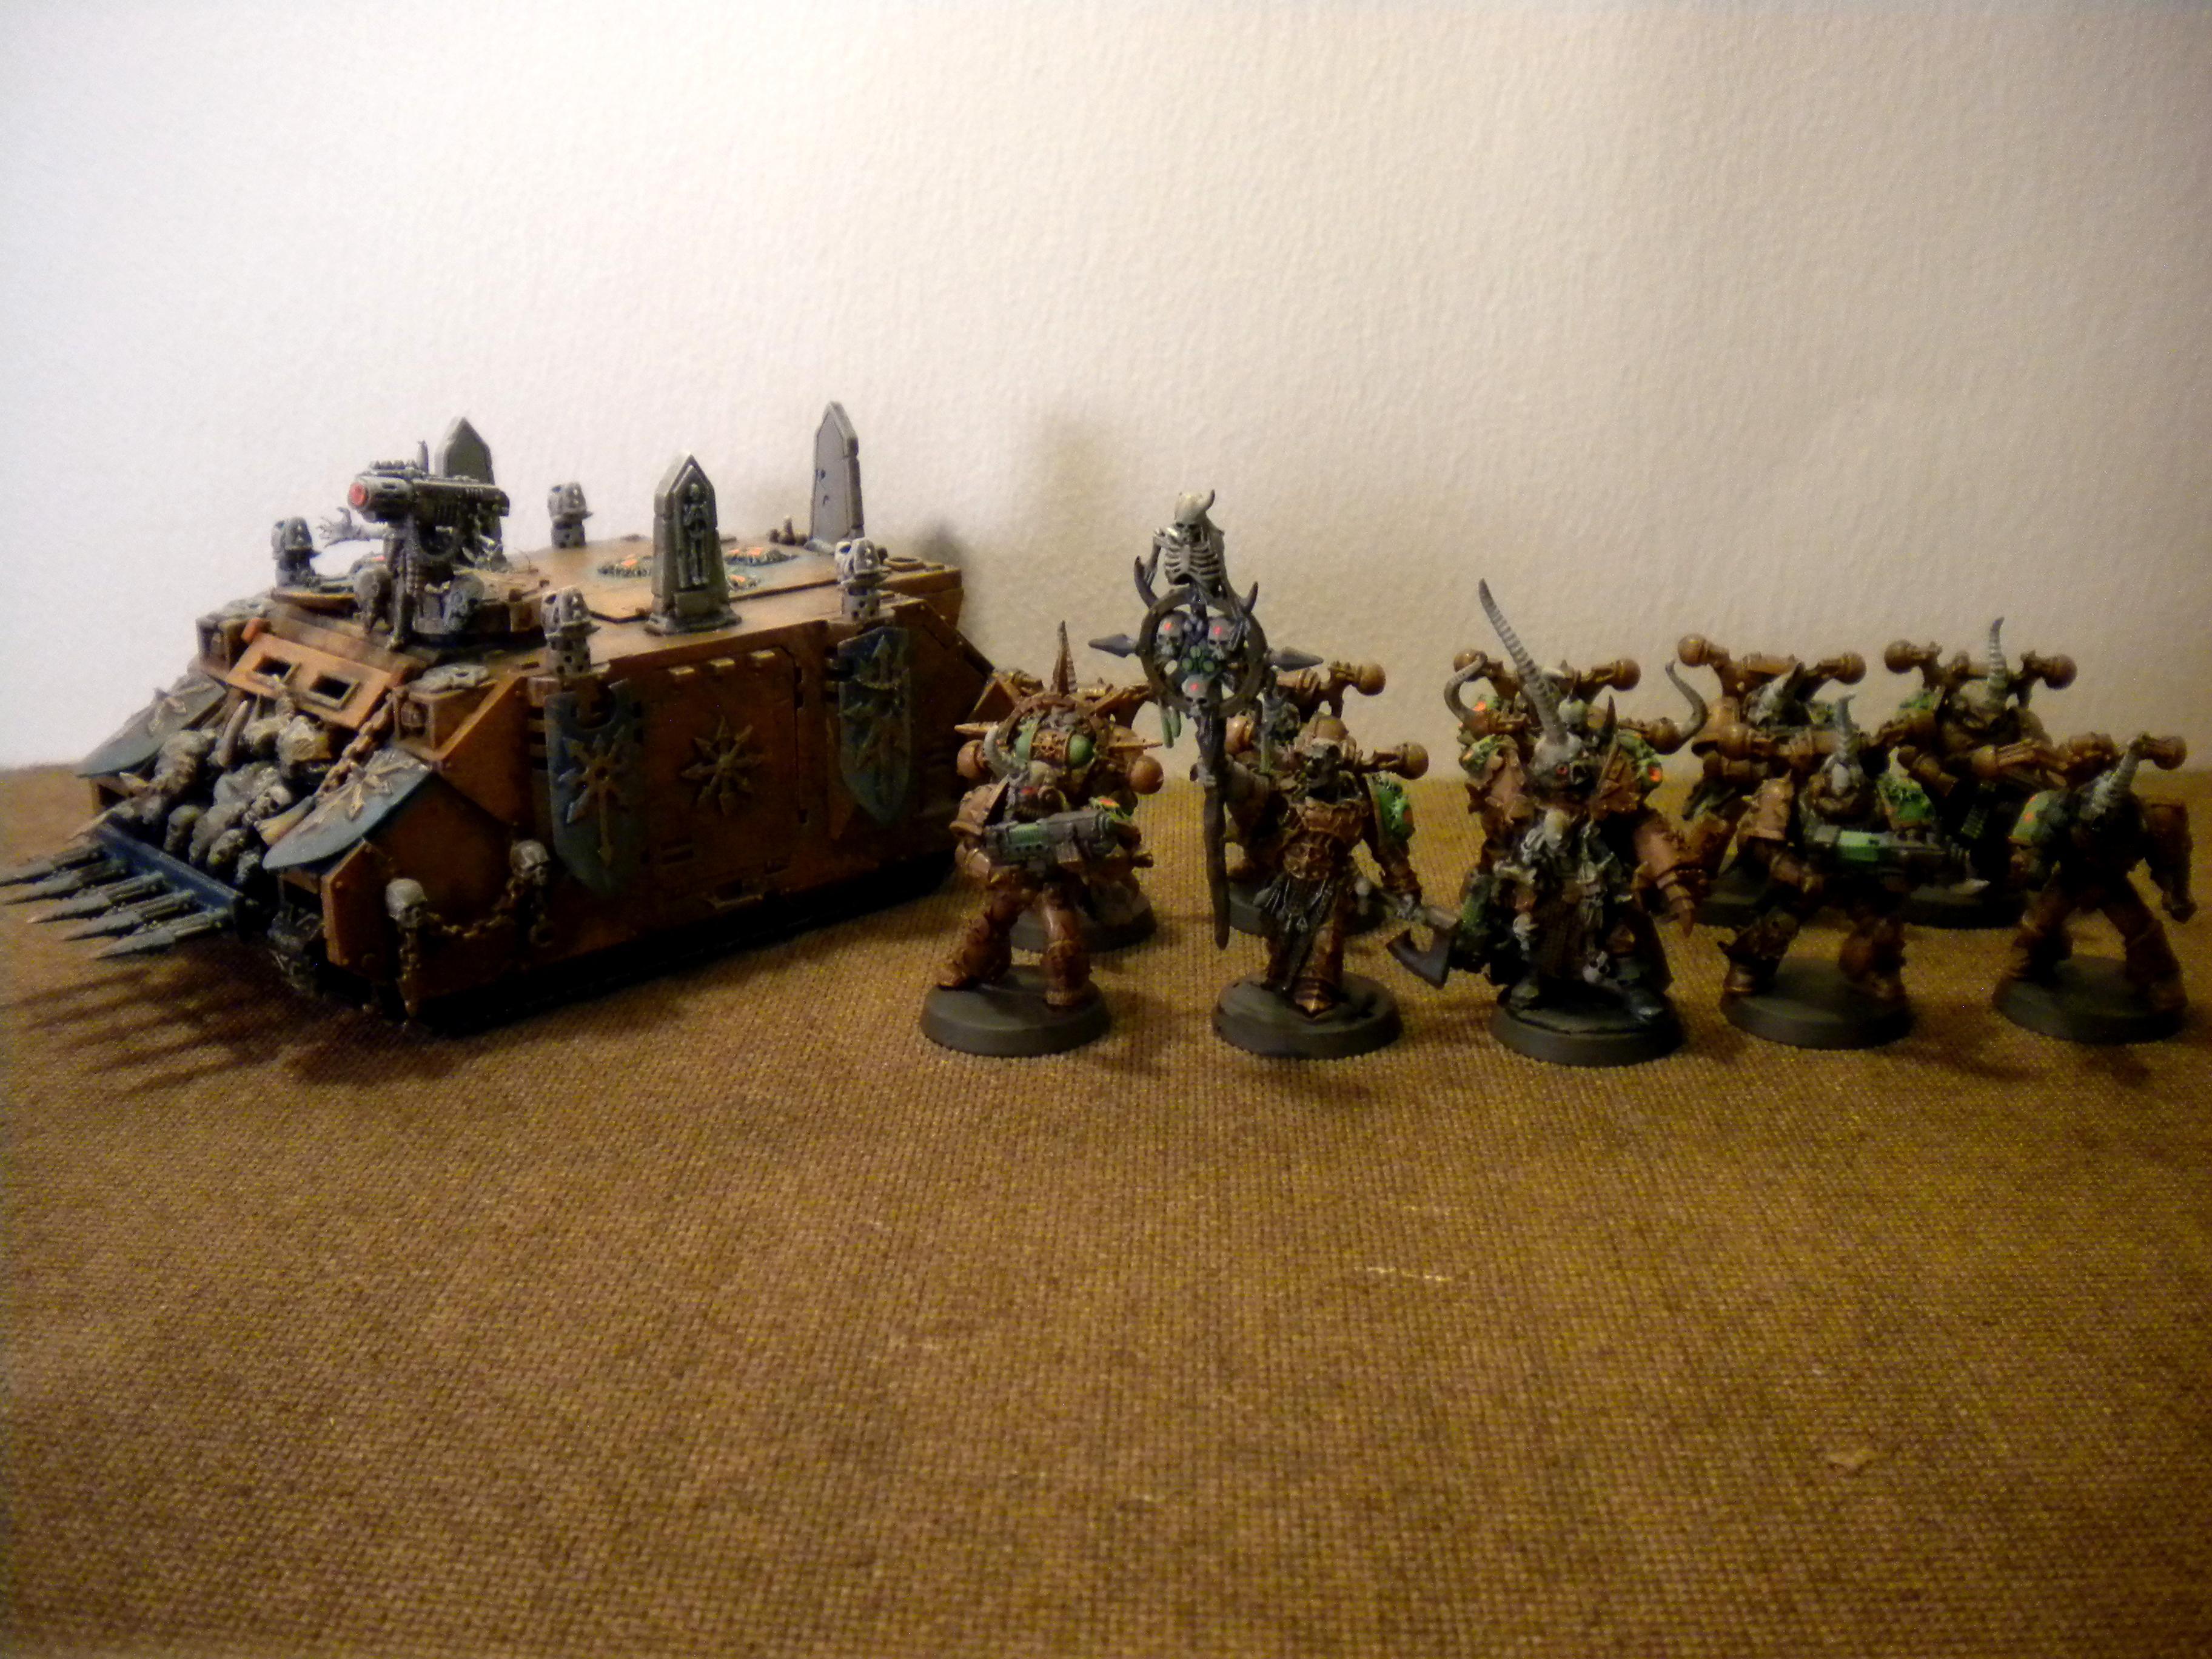 Chaos Space Marines, Death Guard, Nurgle, Warhammer 40,000